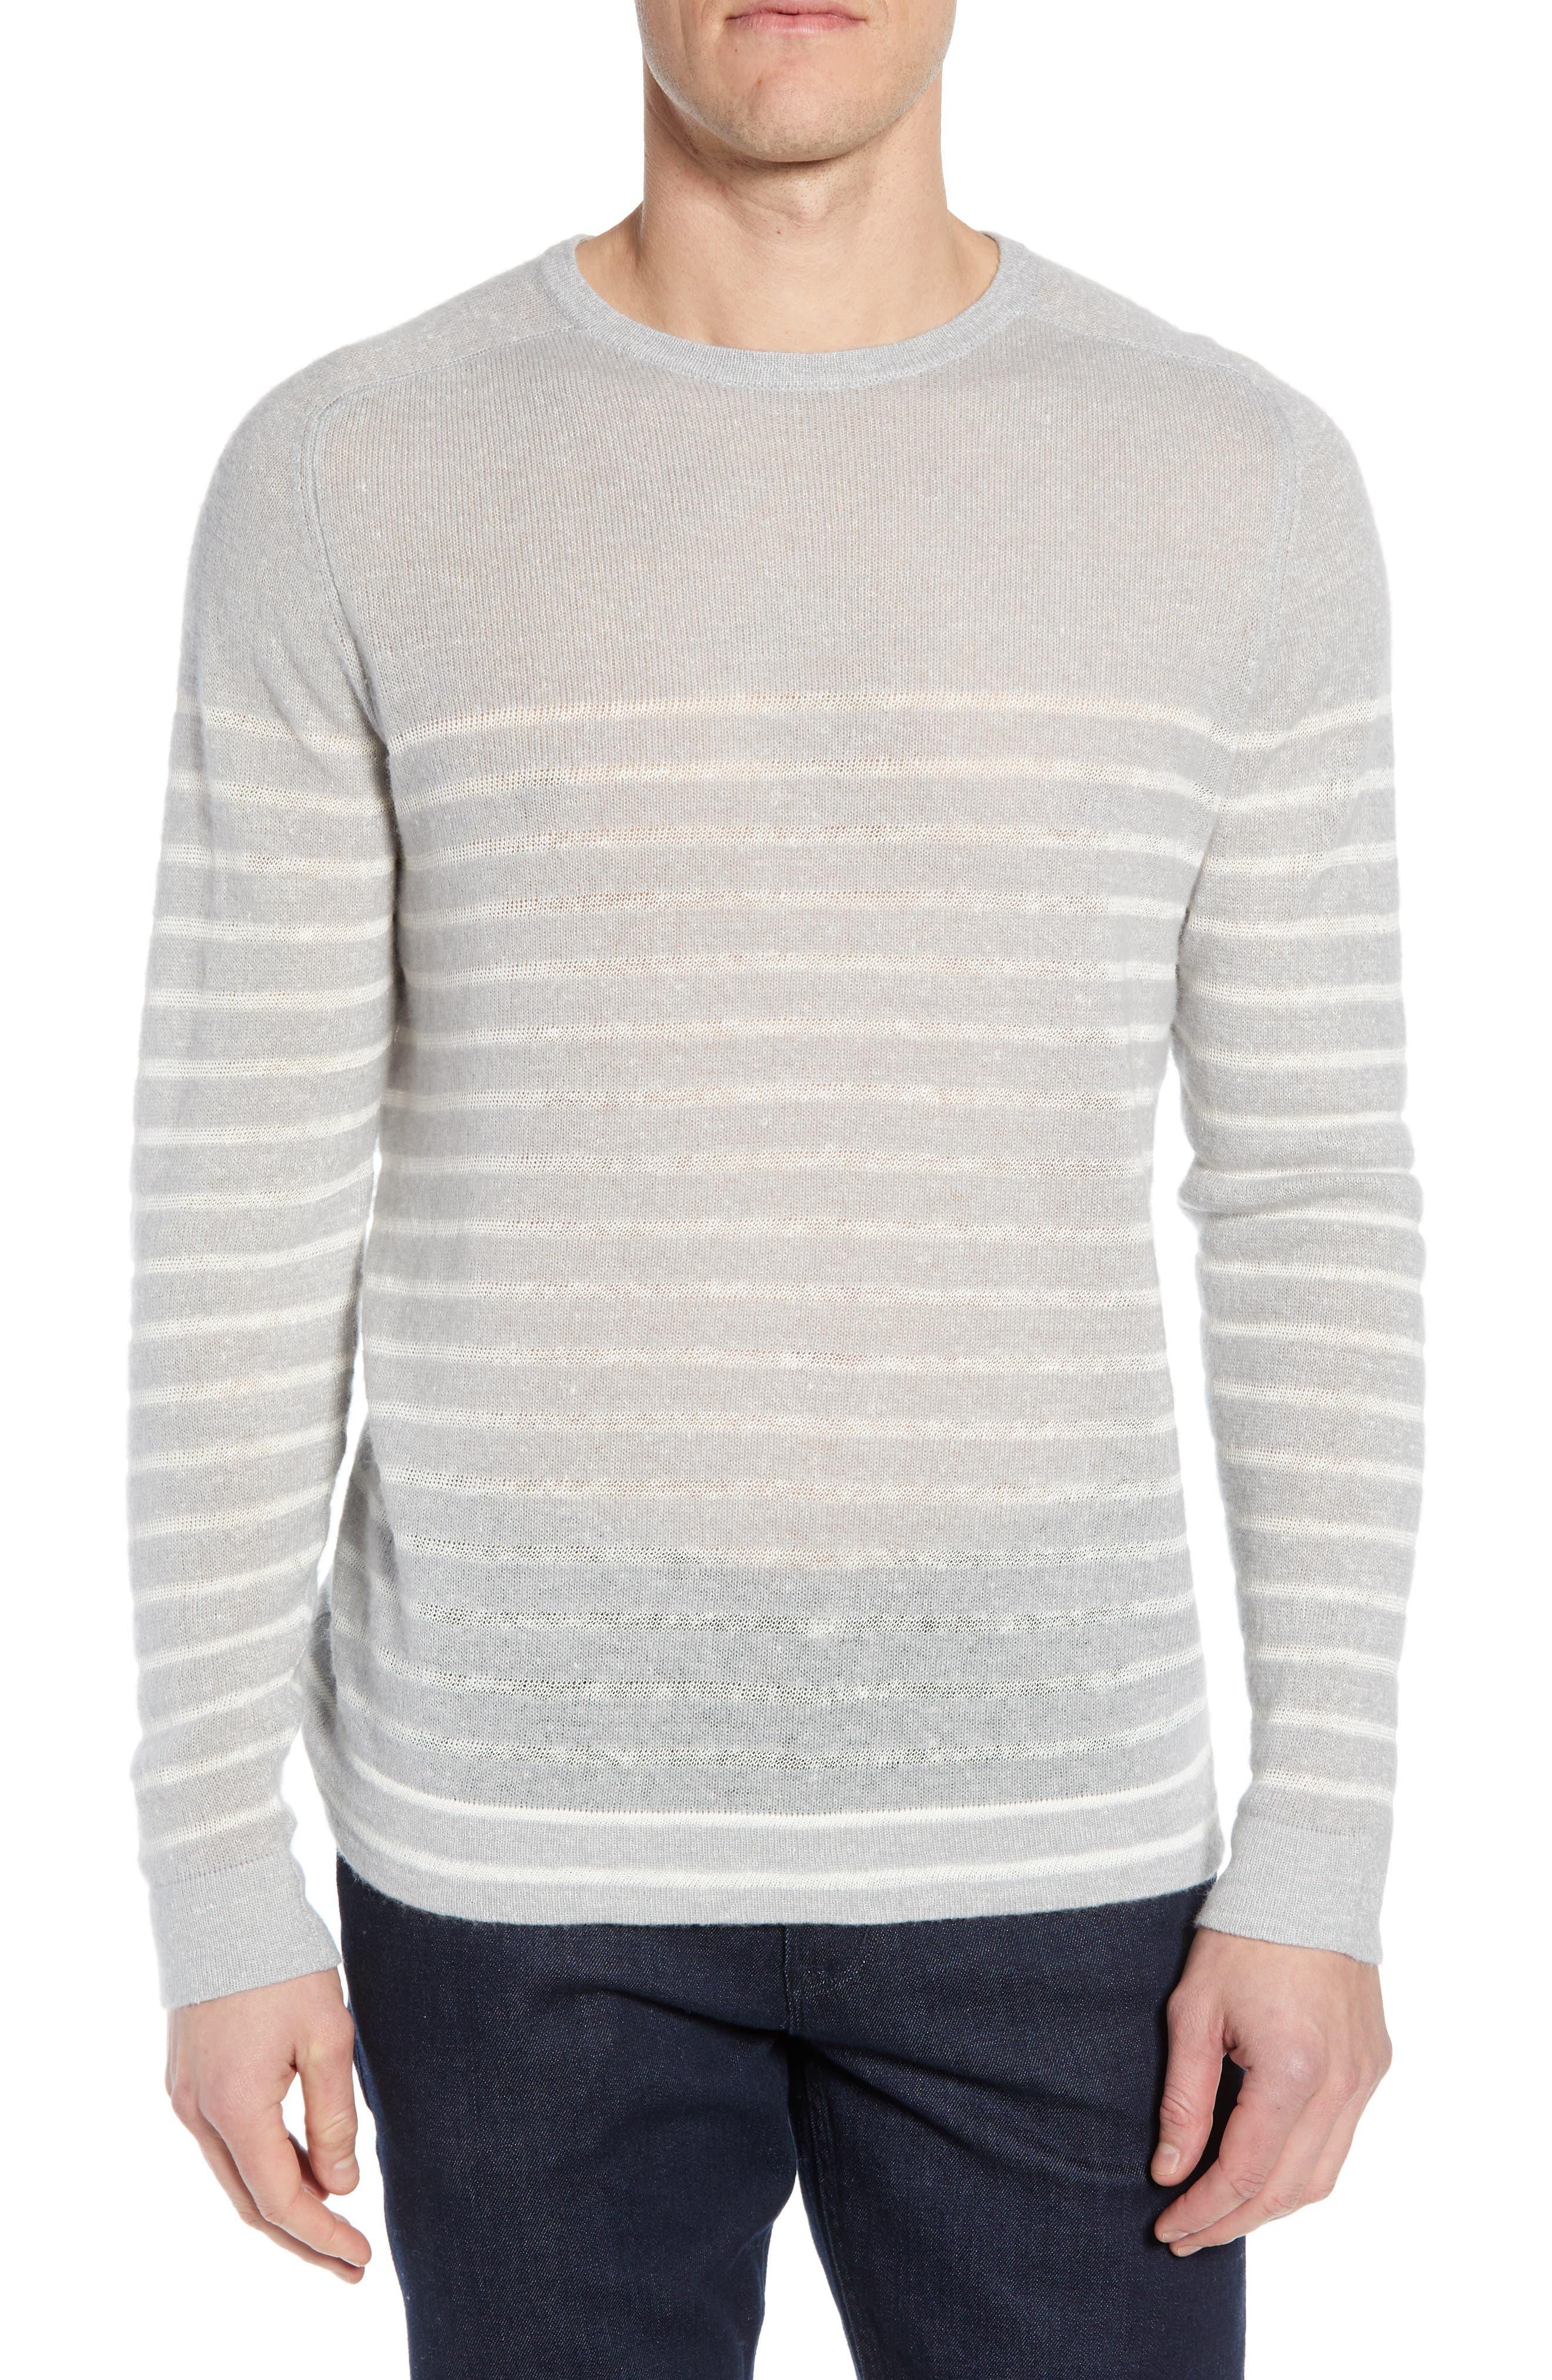 Nordstrom Signature Stripe Crewneck Cashmere & Linen Sweater